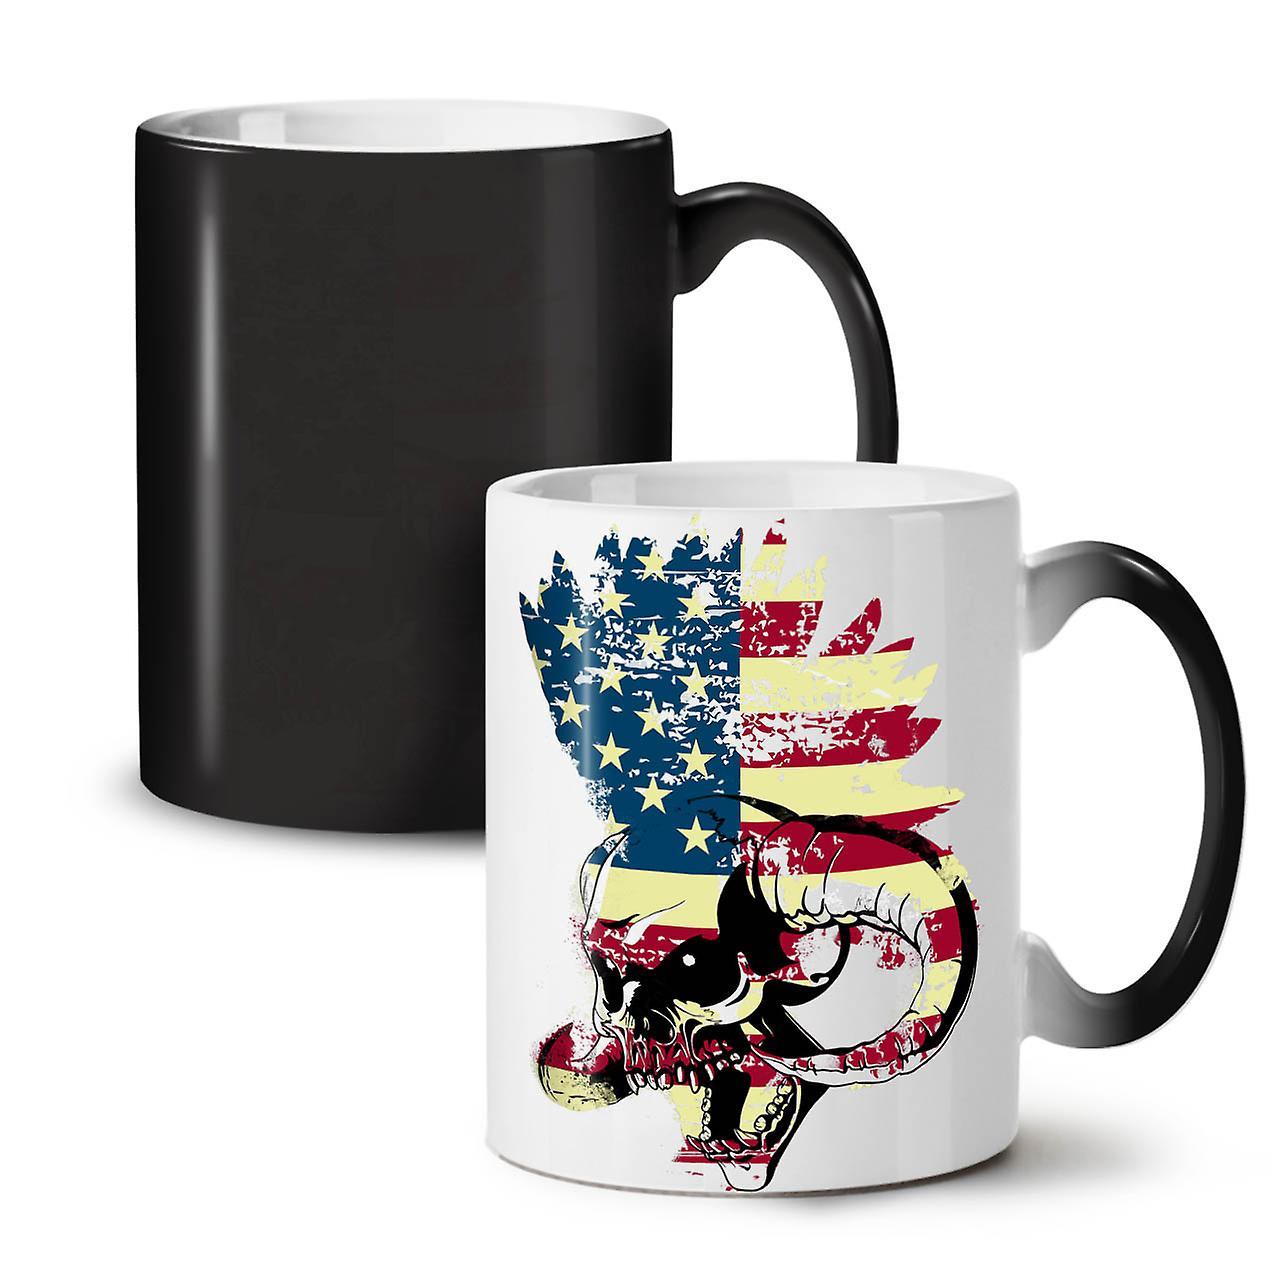 Funk 11 New Black Tea OzWellcoda Changing Ceramic Flag Mug Usa Coffee Metal Colour RScAq3j45L